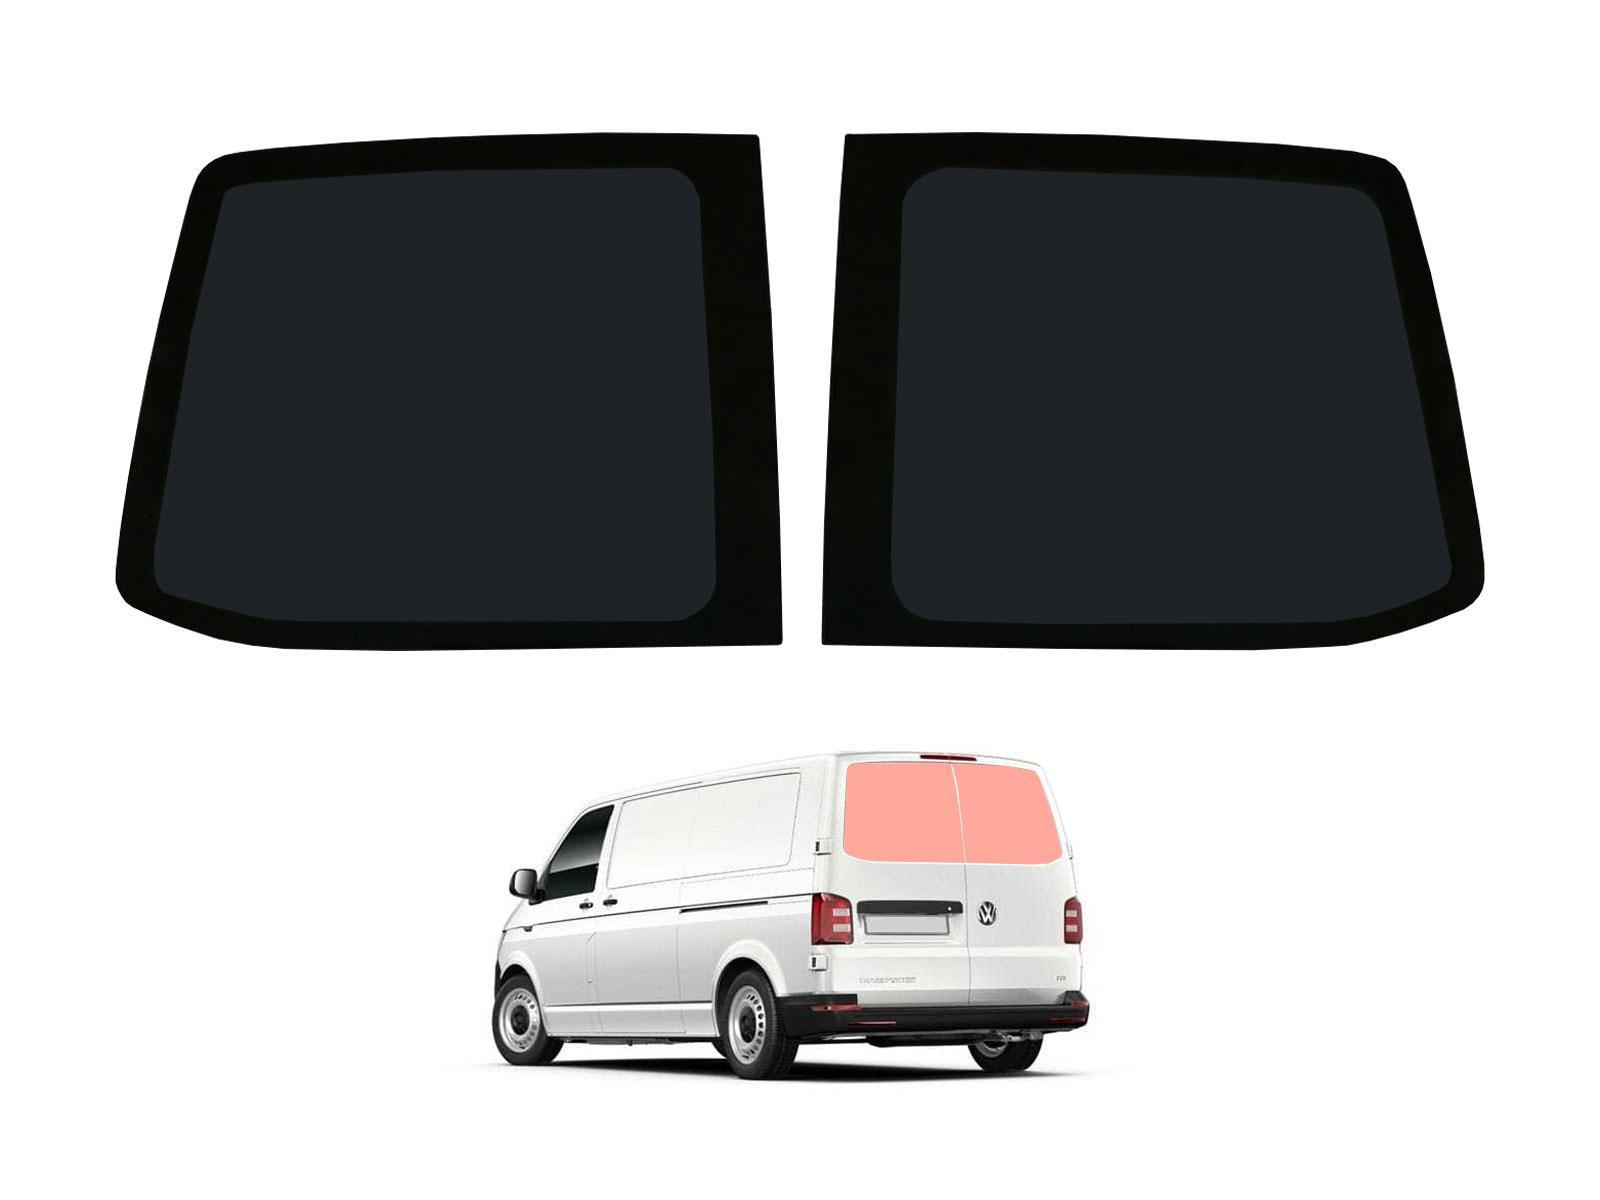 03-15 Rear Barn Door Dark Tint Windows Pair Van Glass for VW Transporter T5